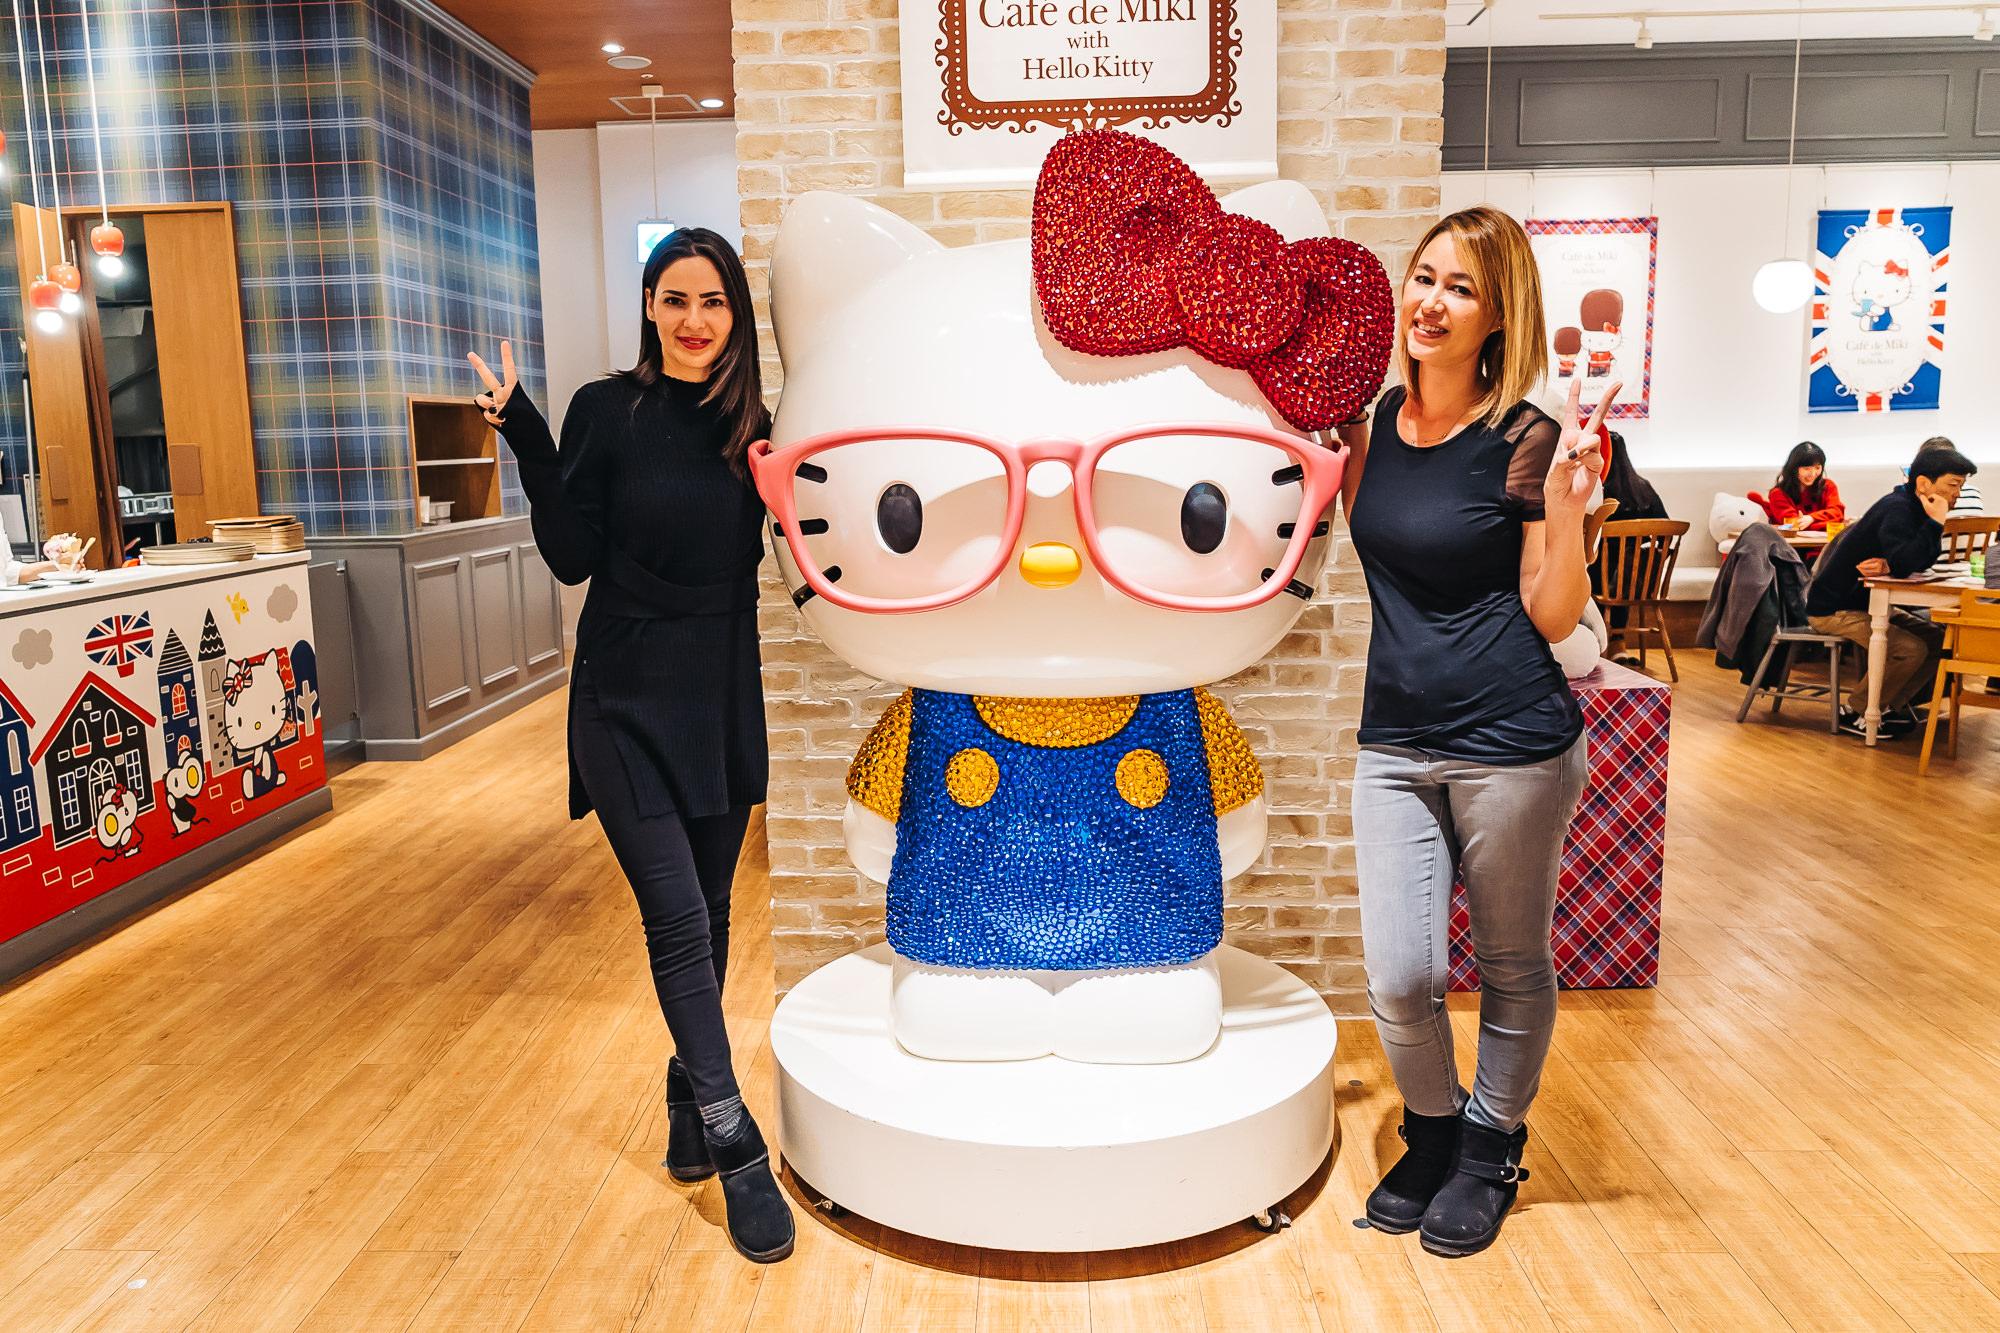 Hello Kitty Cafe - Cafe de Miki in Odaiba, Japan